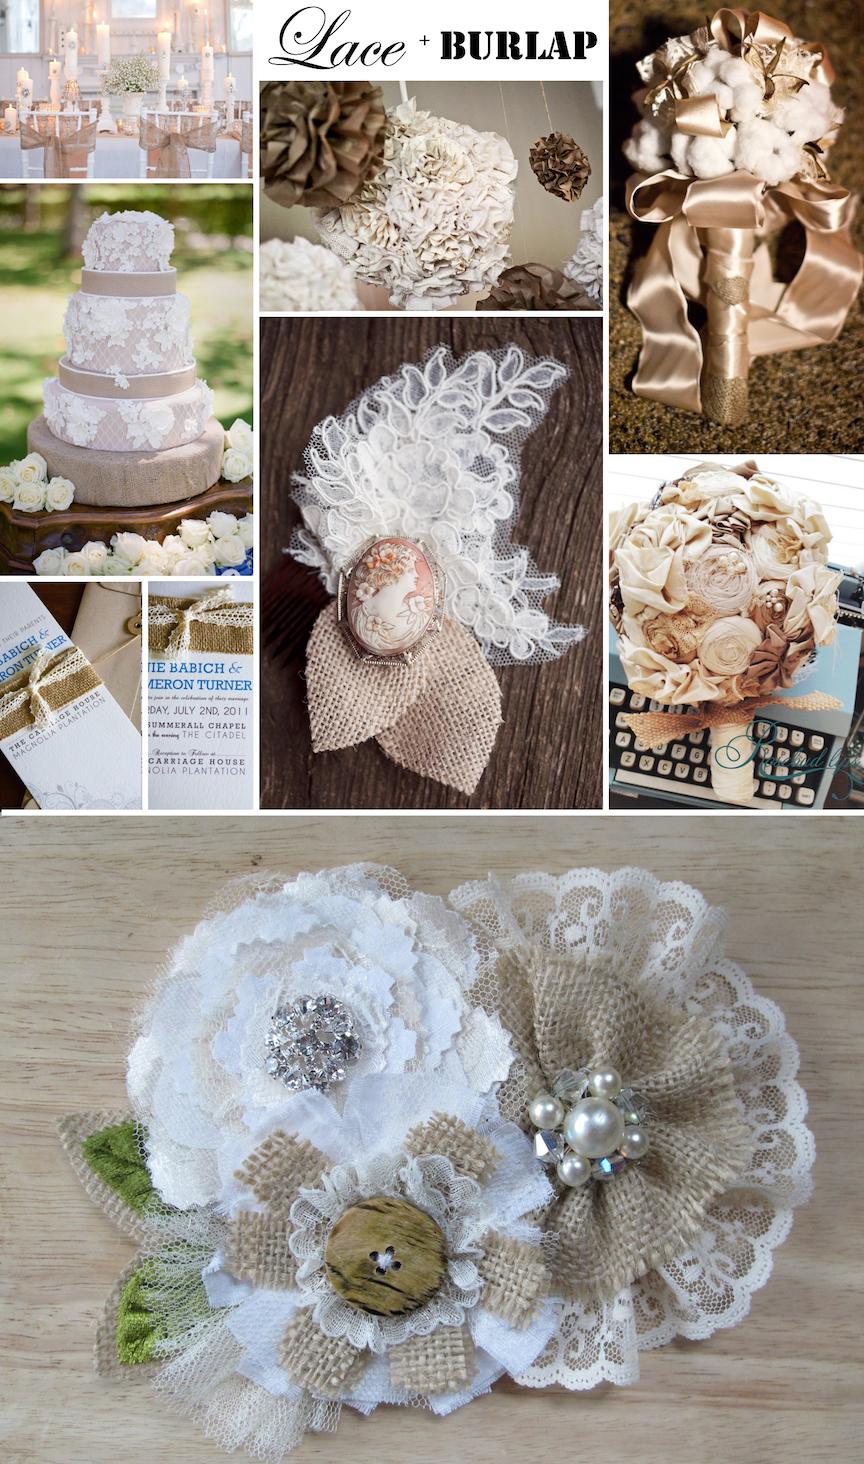 Wedding decorations accessories  Burlaplacerusticweddingaccessoriesromanticweddingideas